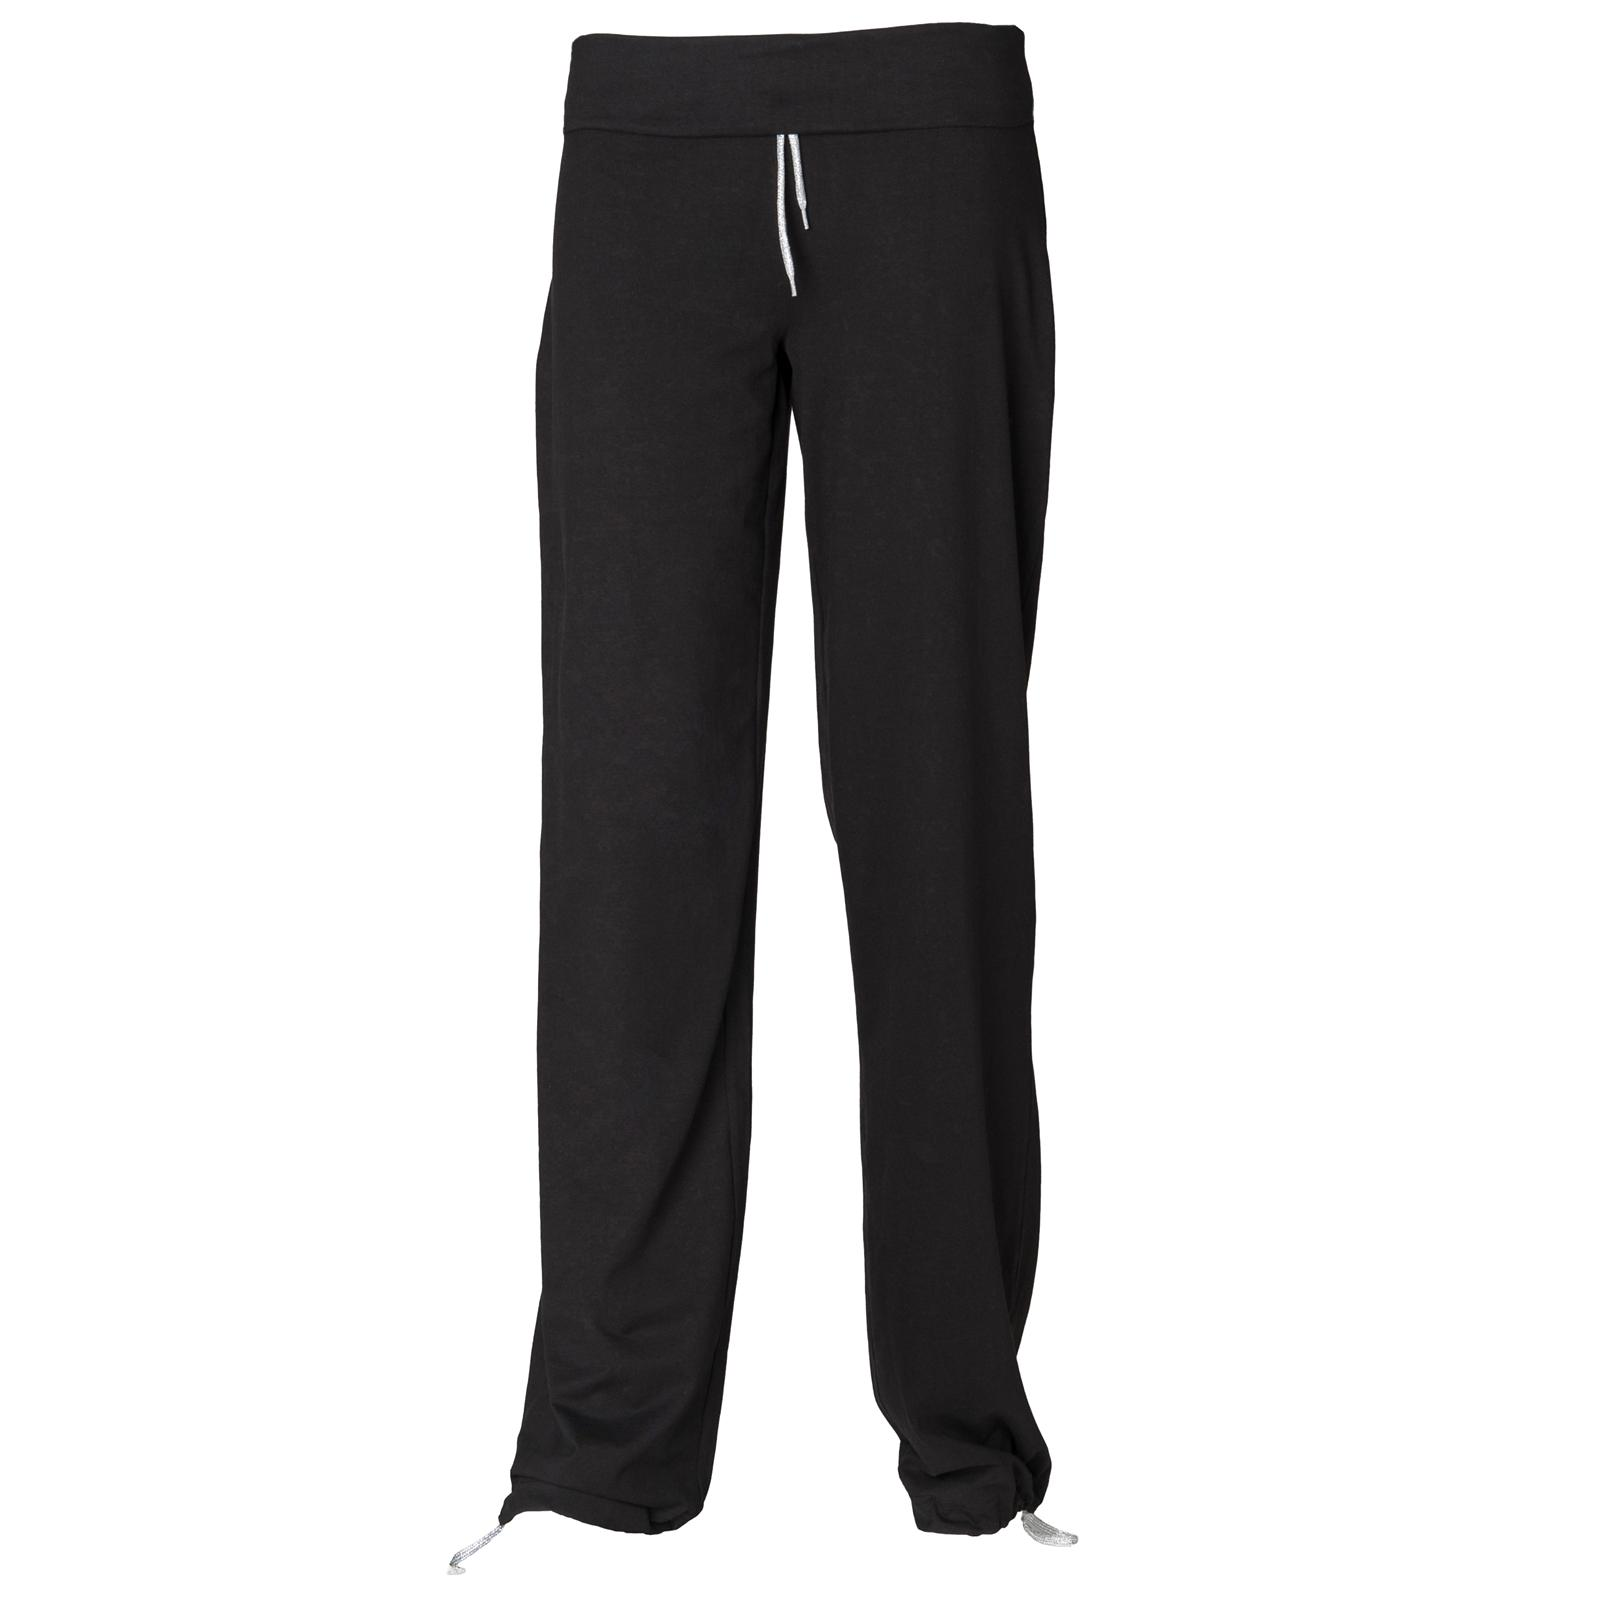 New-Skinni-Fit-Womens-Ladies-Fitness-Sports-Slounge-Tie-Up-Jog-Pants-Black-S-XL